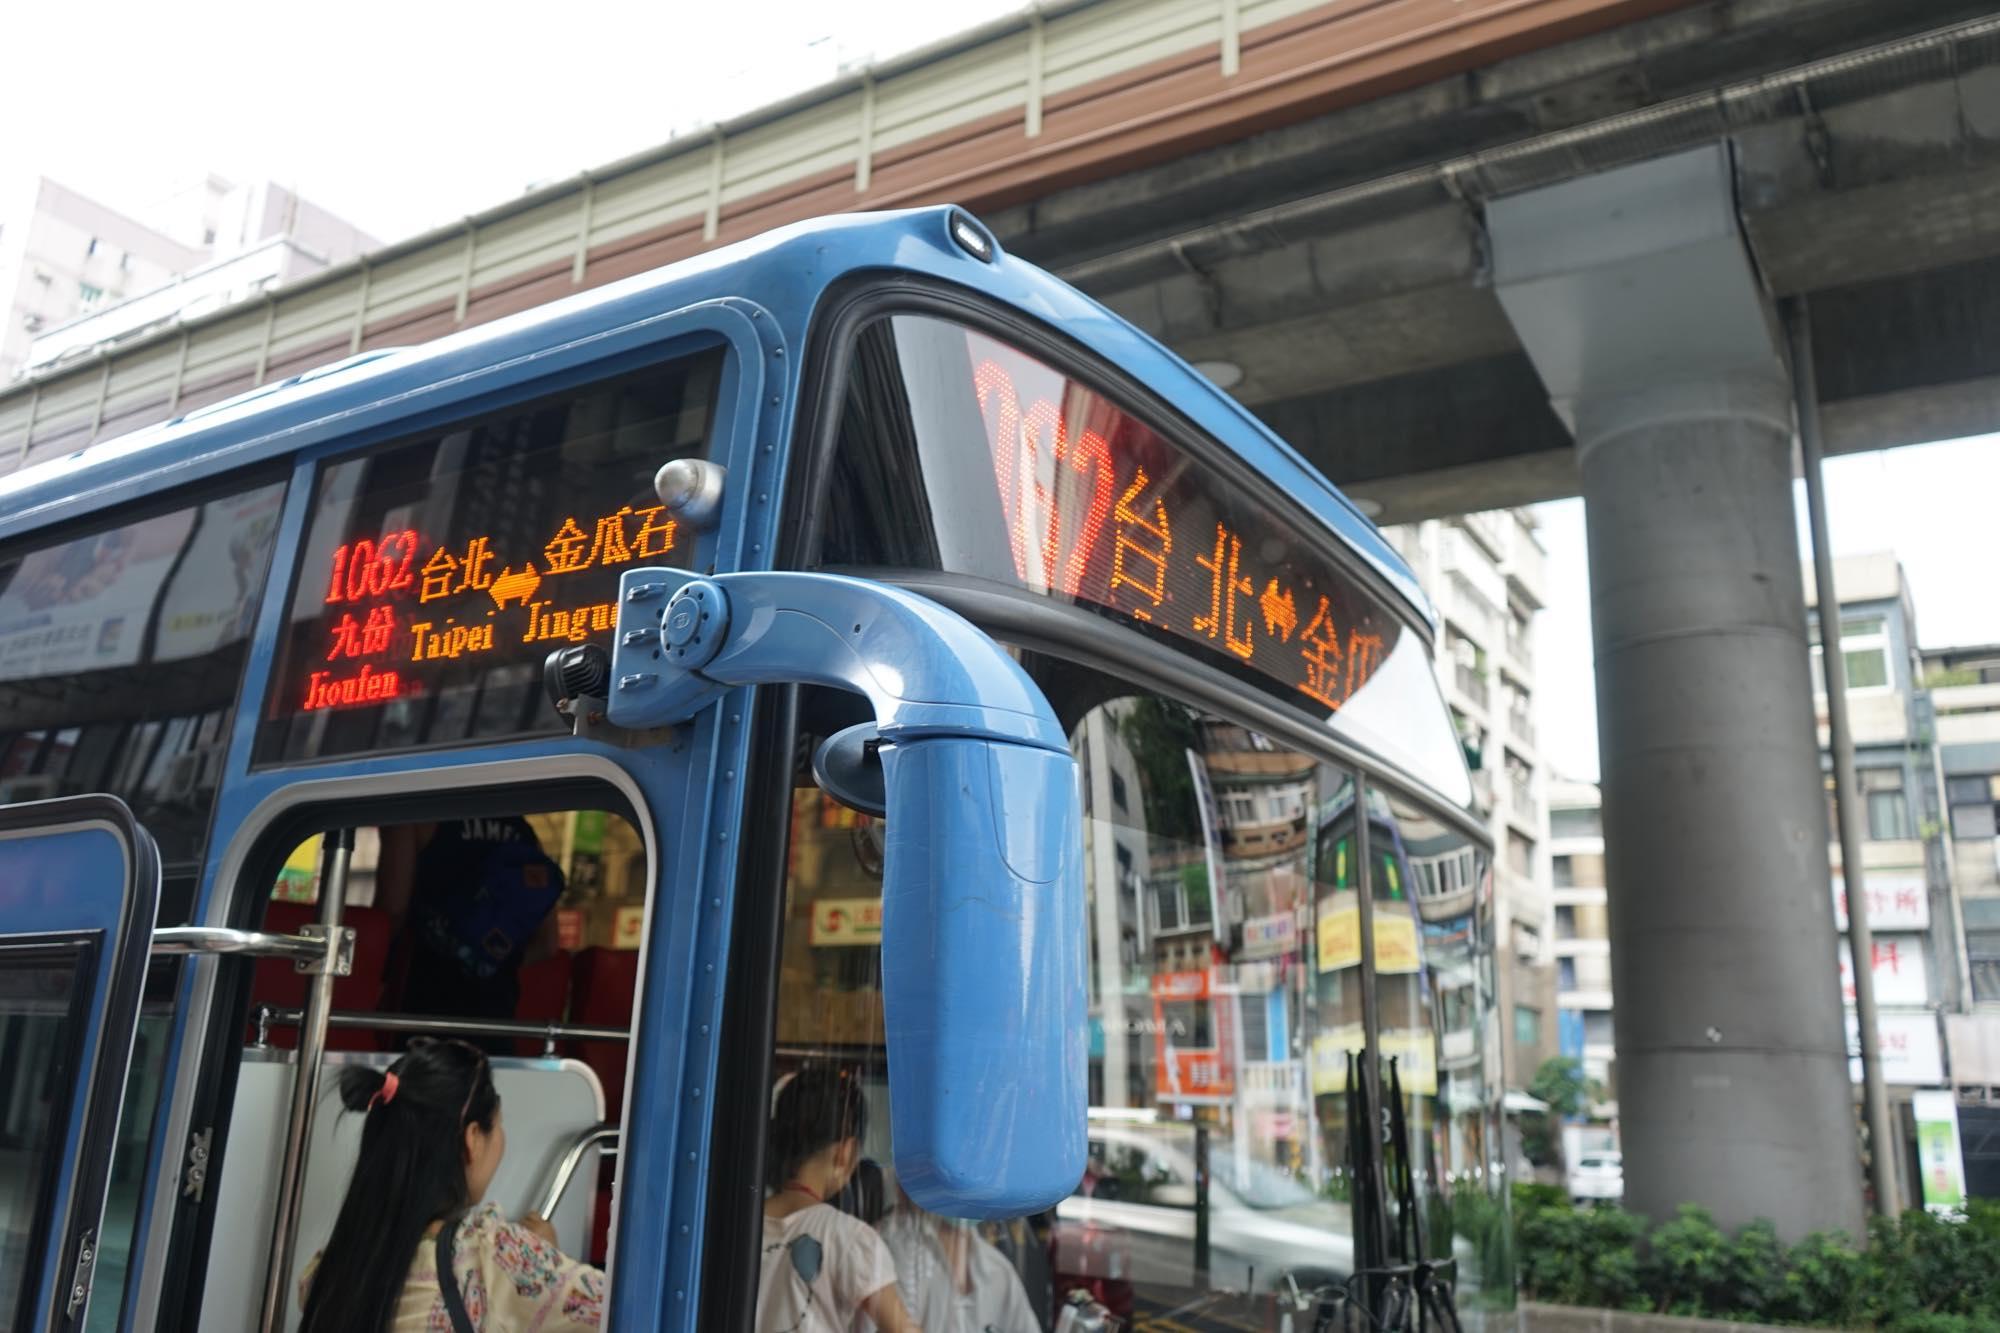 taipei-joufeng-bus12